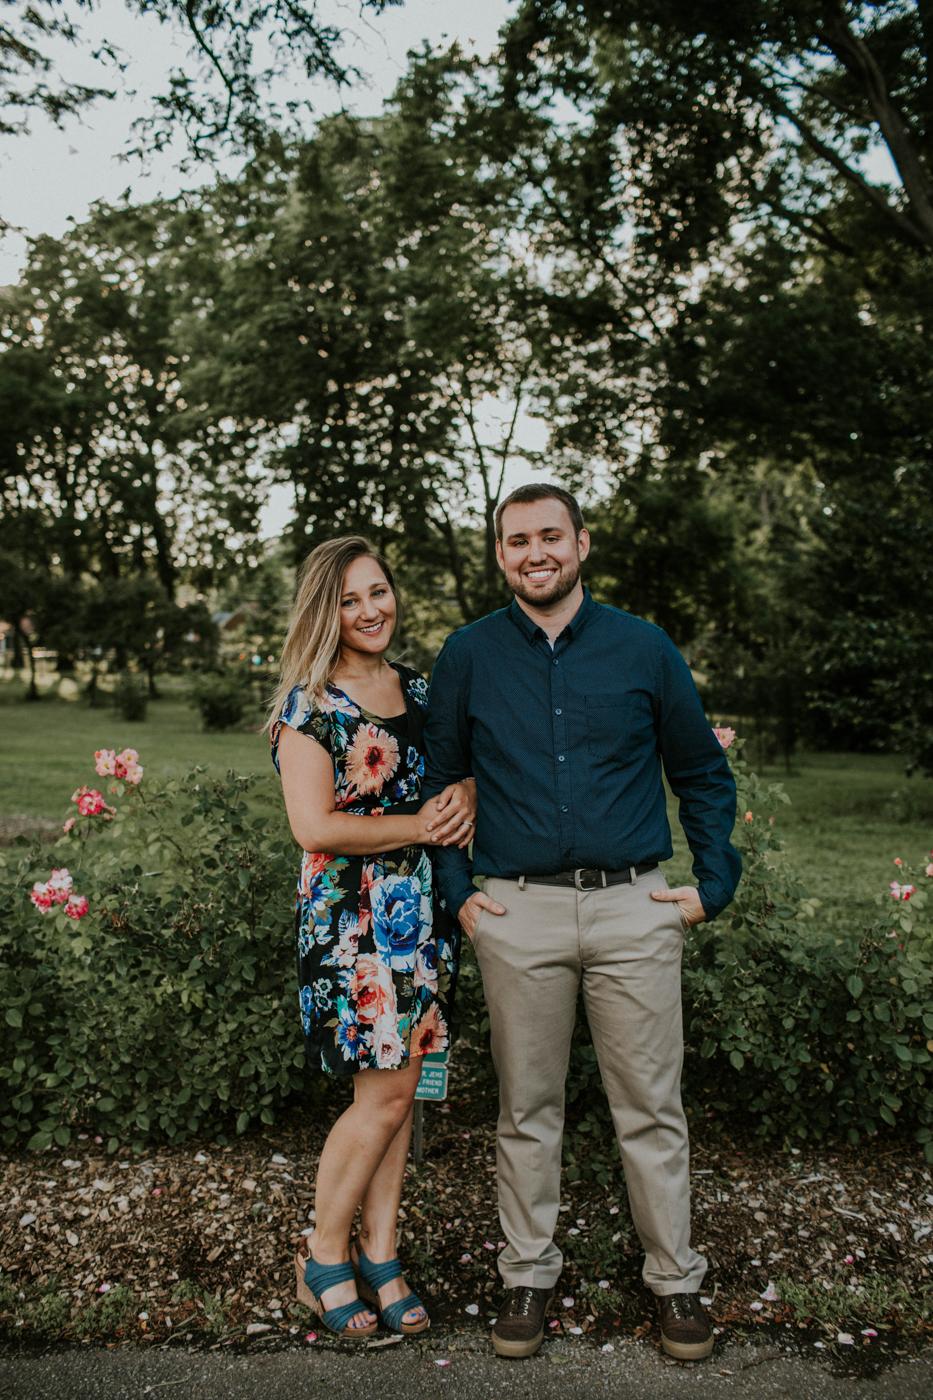 columbus ohio engagement and wedding photographer Grace E Jones